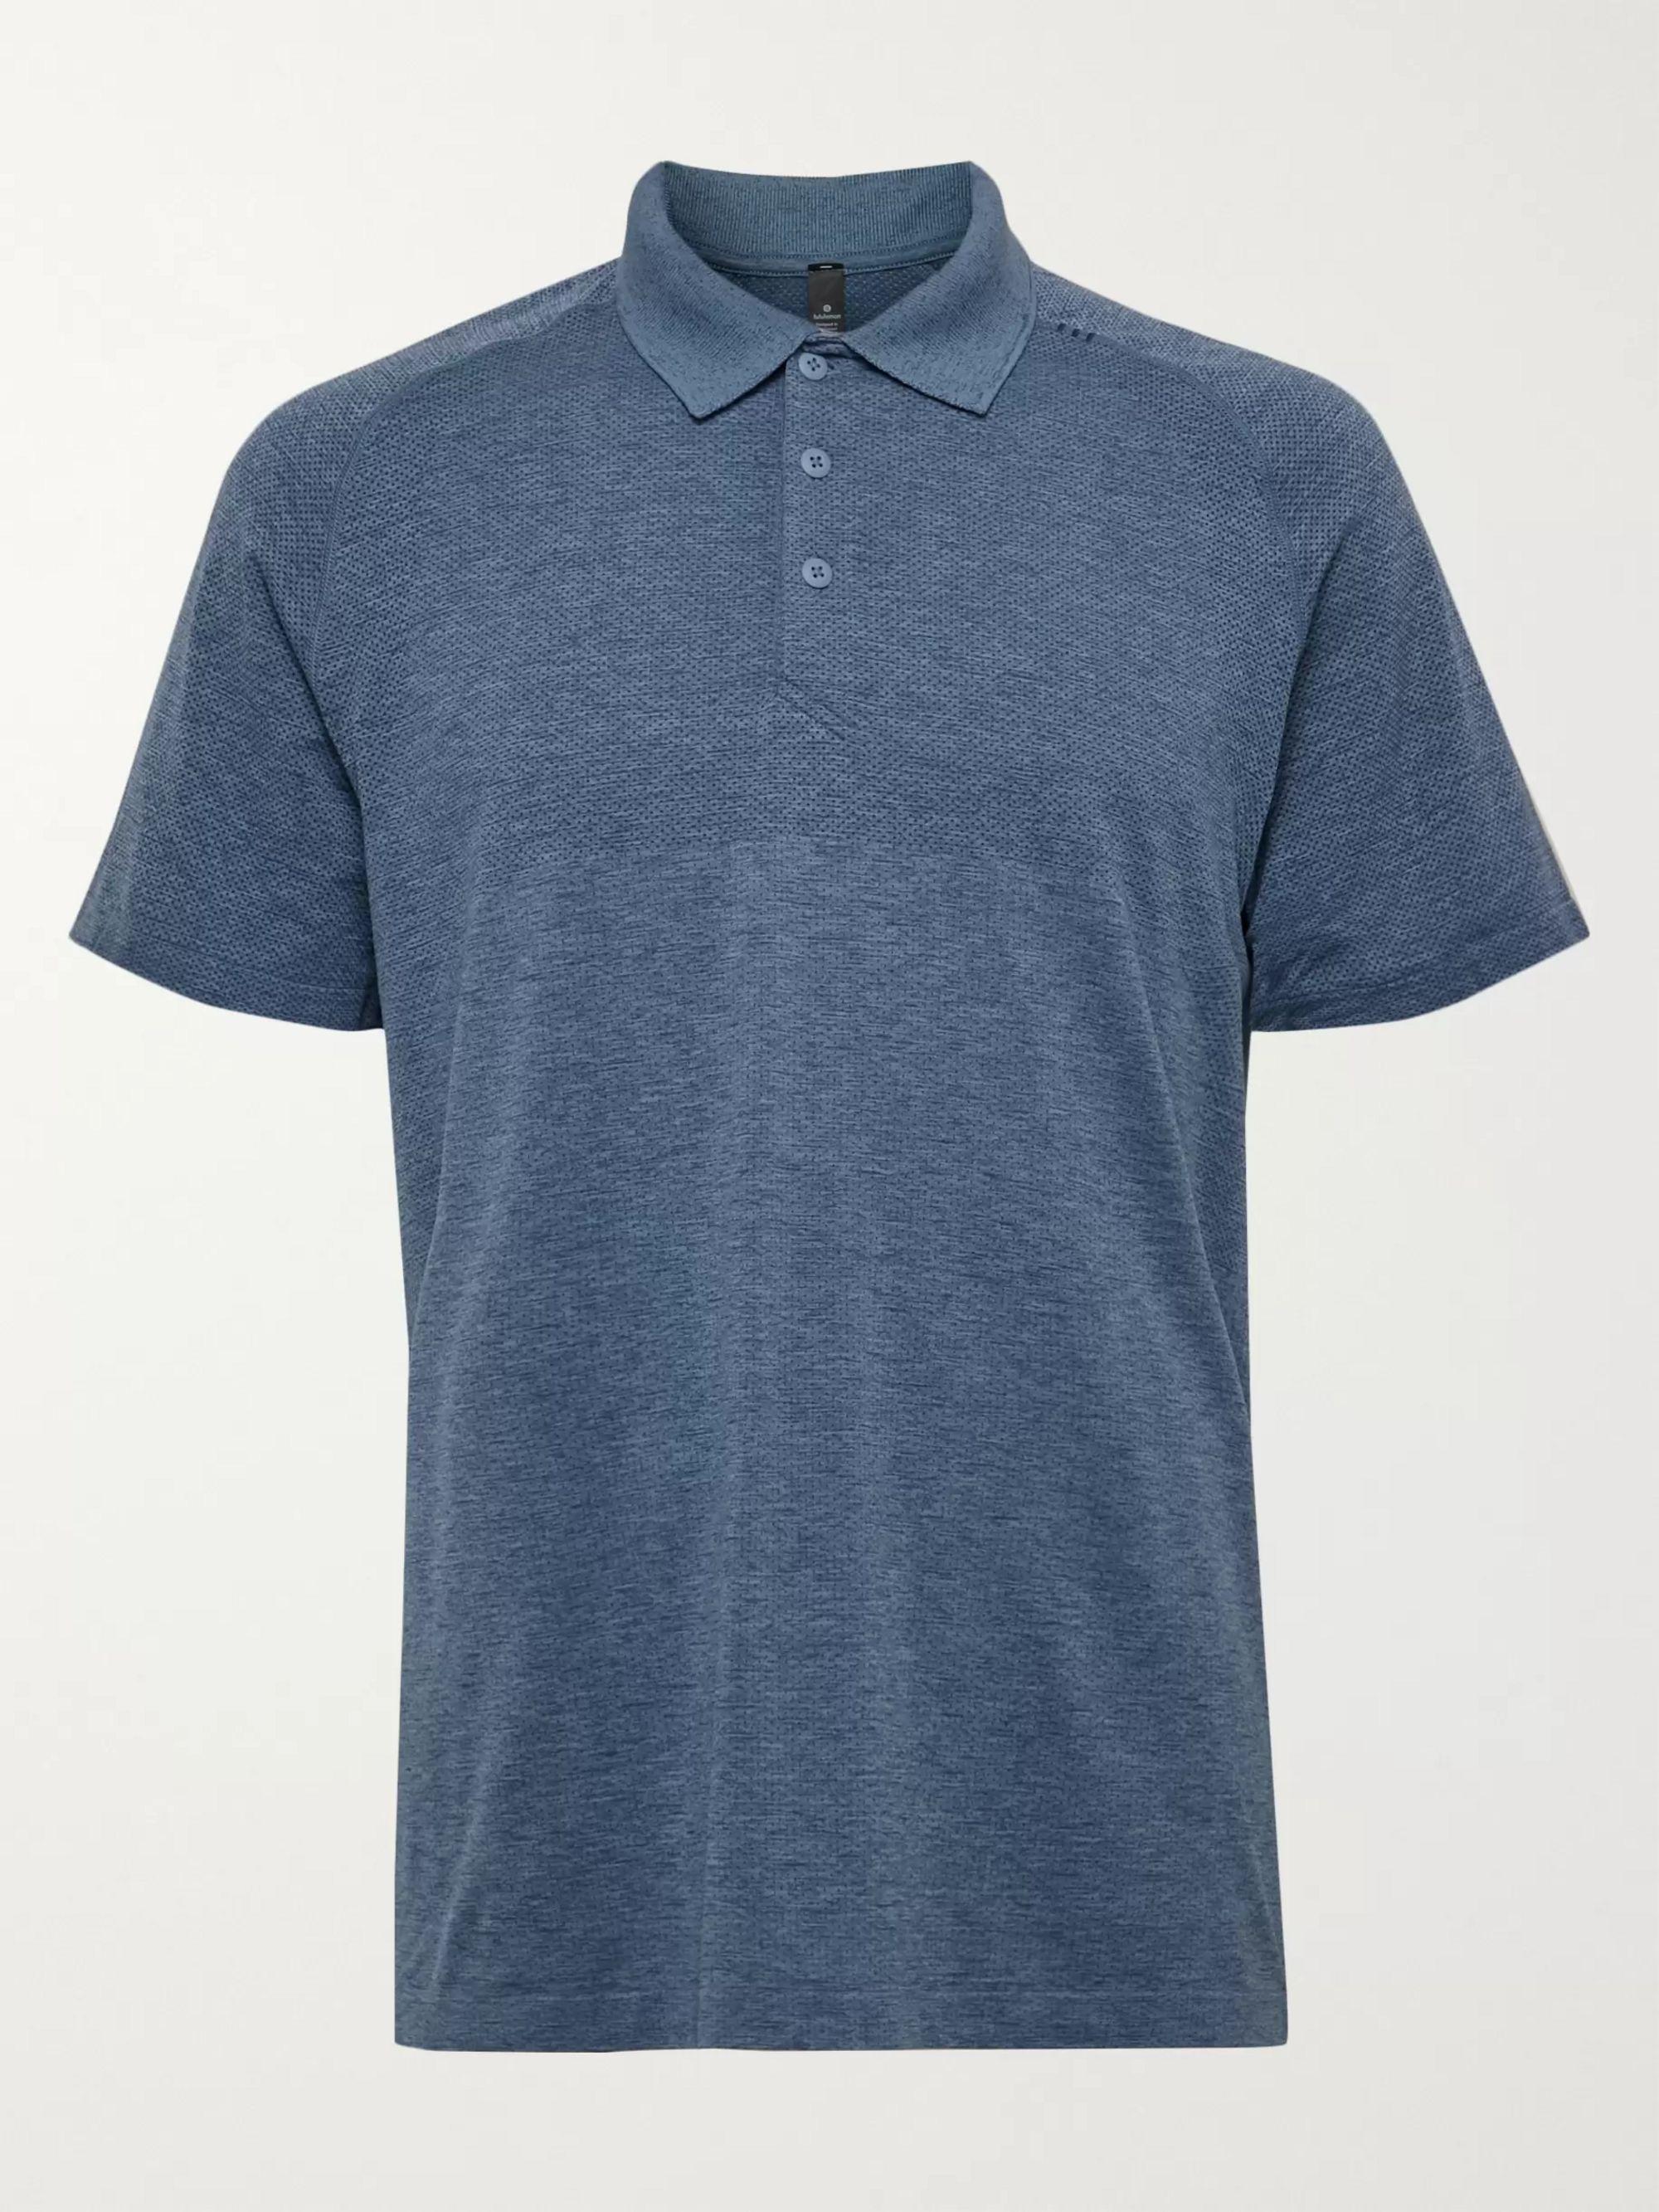 Lululemon Metal Vent Tech 2.0 Melange Stretch-Jersey Polo Shirt